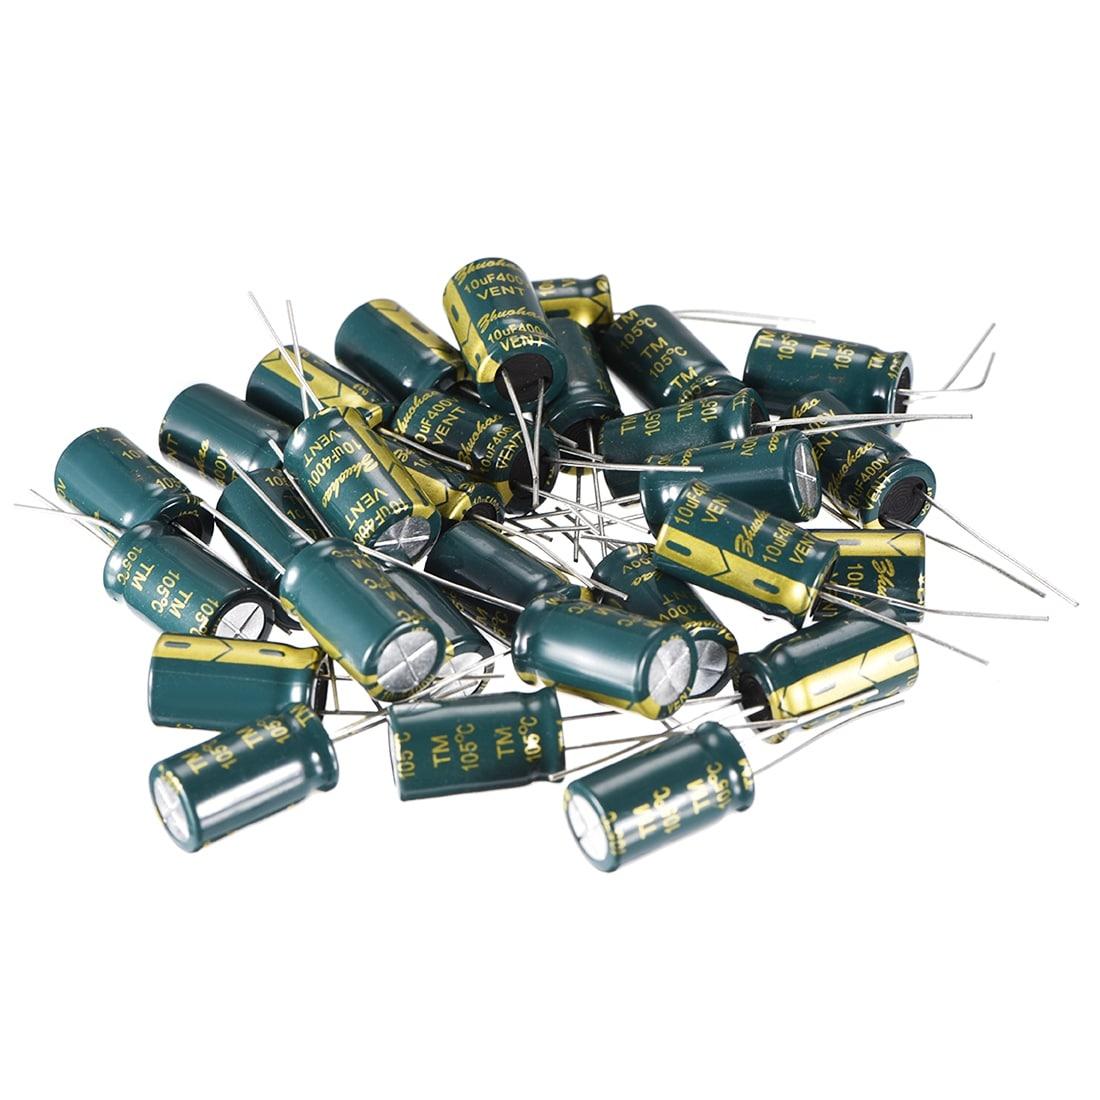 100 x 3.3uF 50V 105C Radial Electrolytic Capacitor 5x11 Free USA SHIPPING